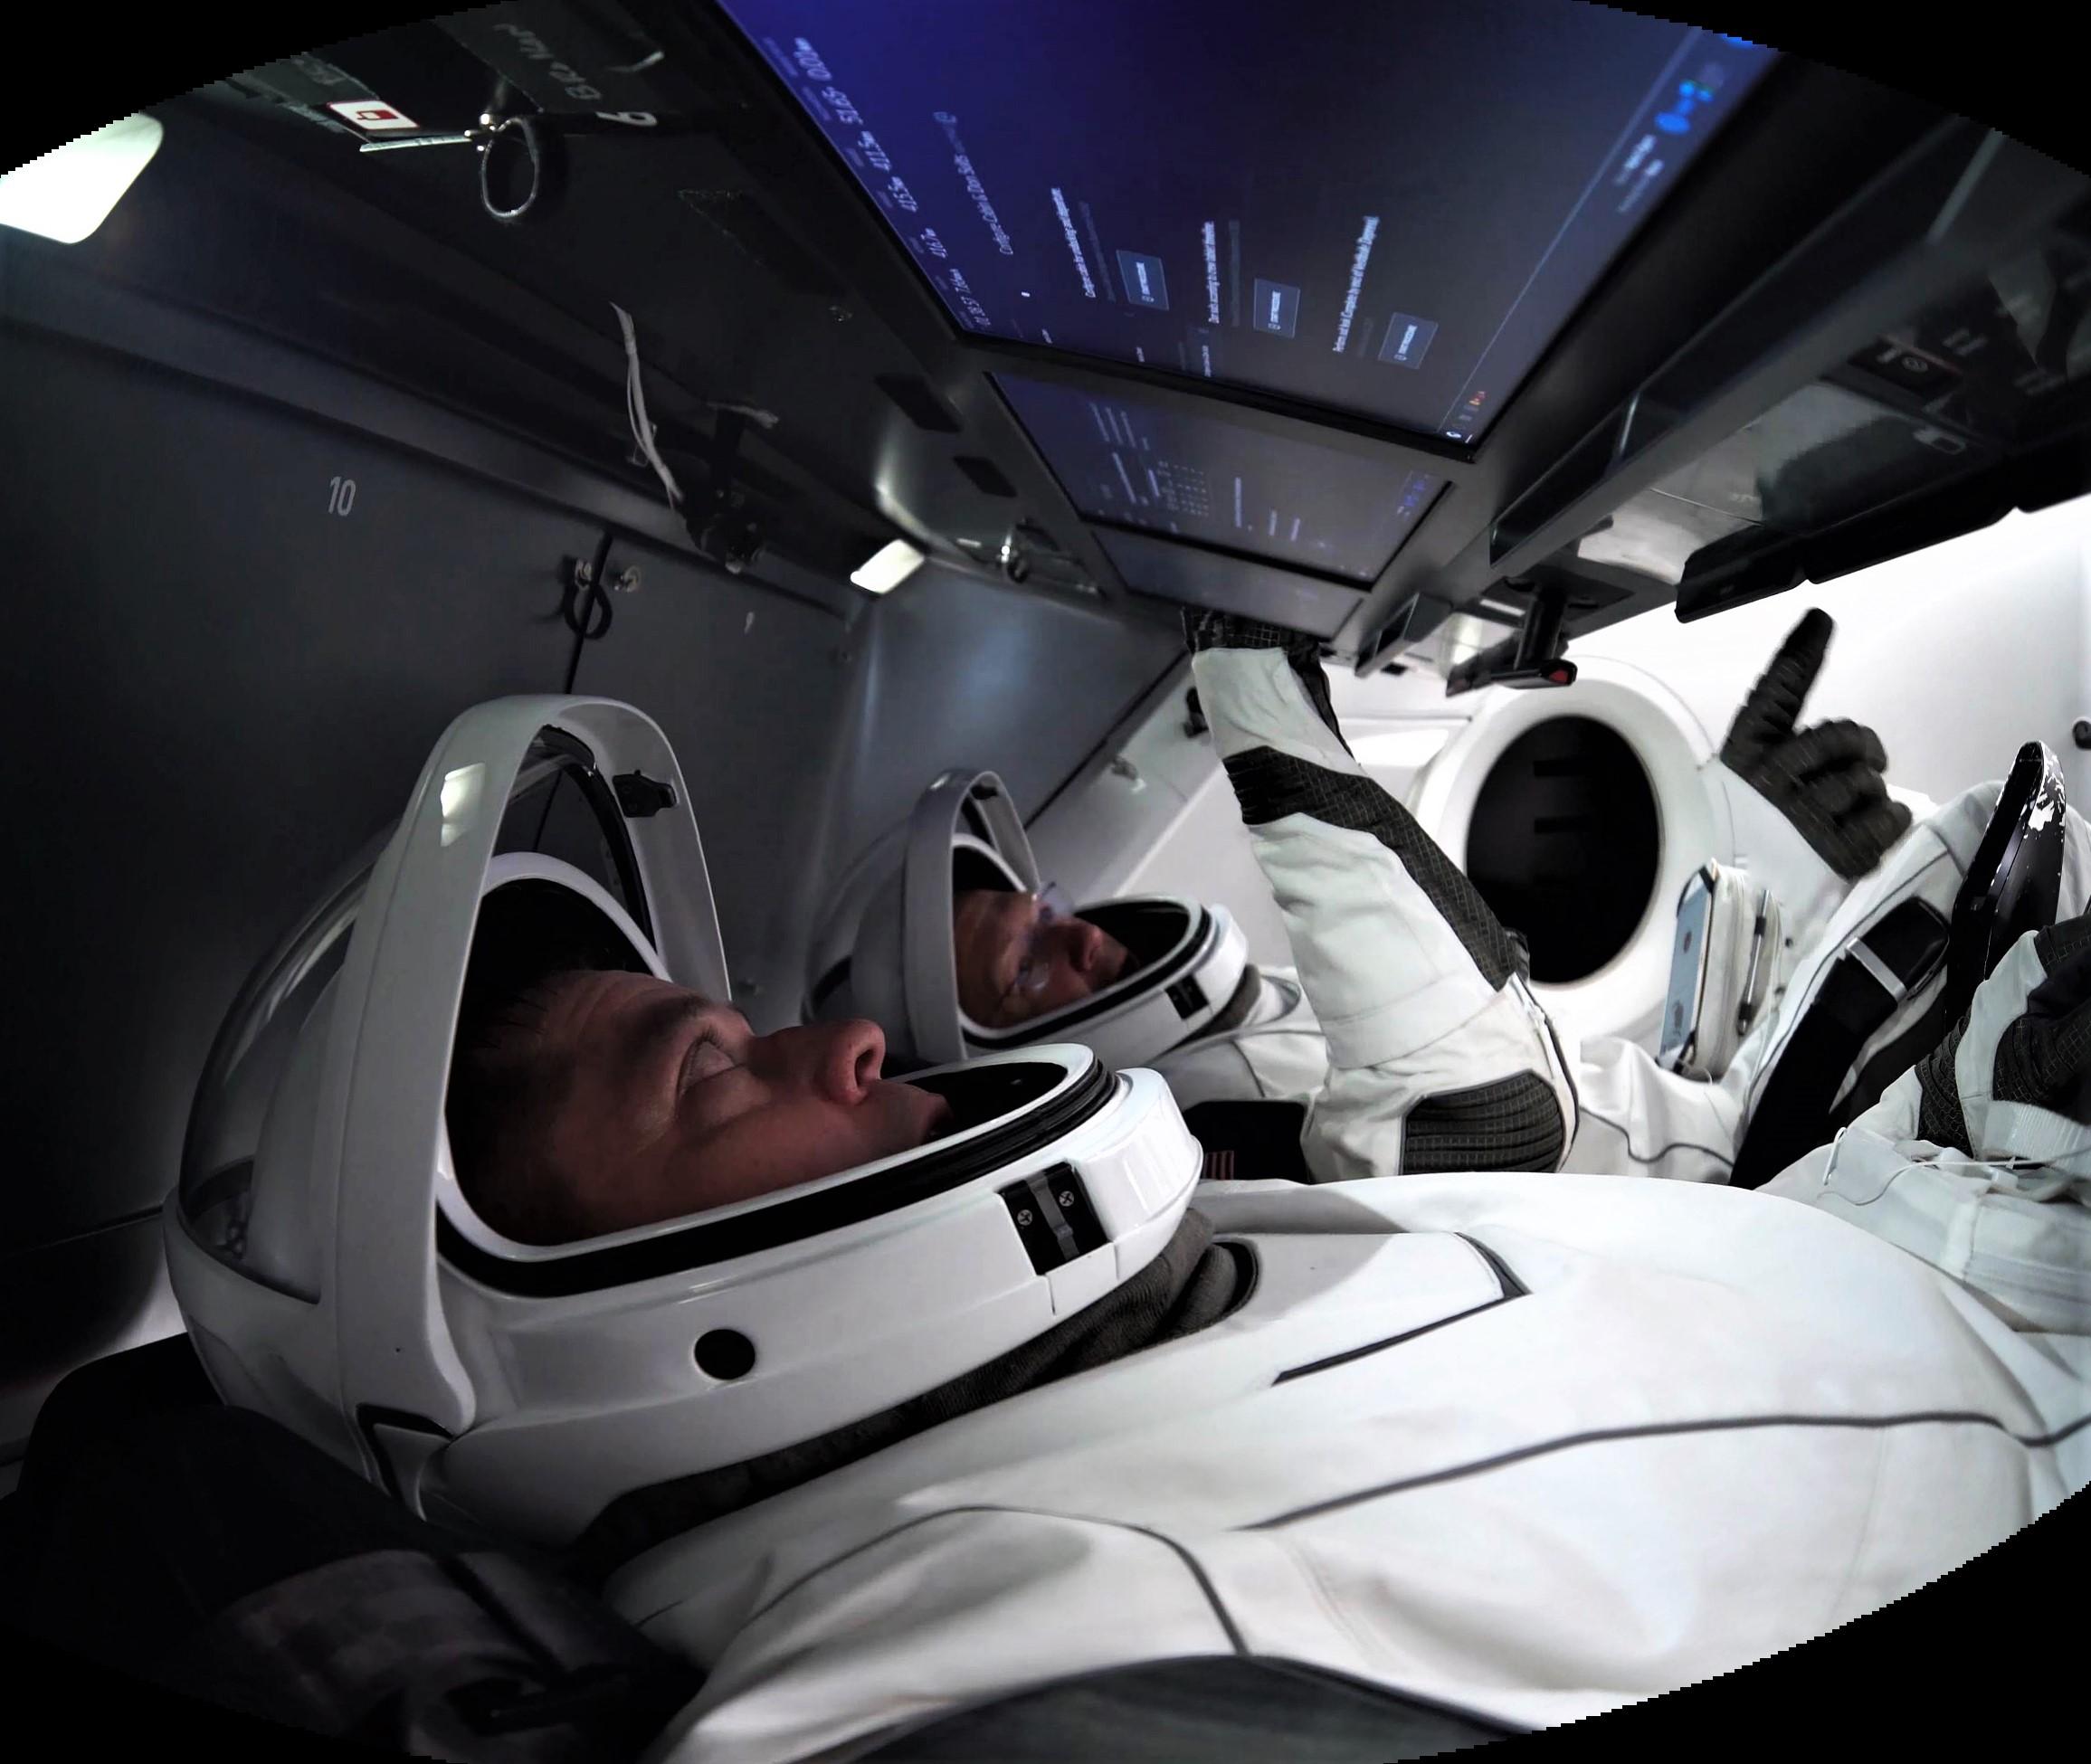 Crew Dragon DM-2 astronaut training video (NASA) pano 2